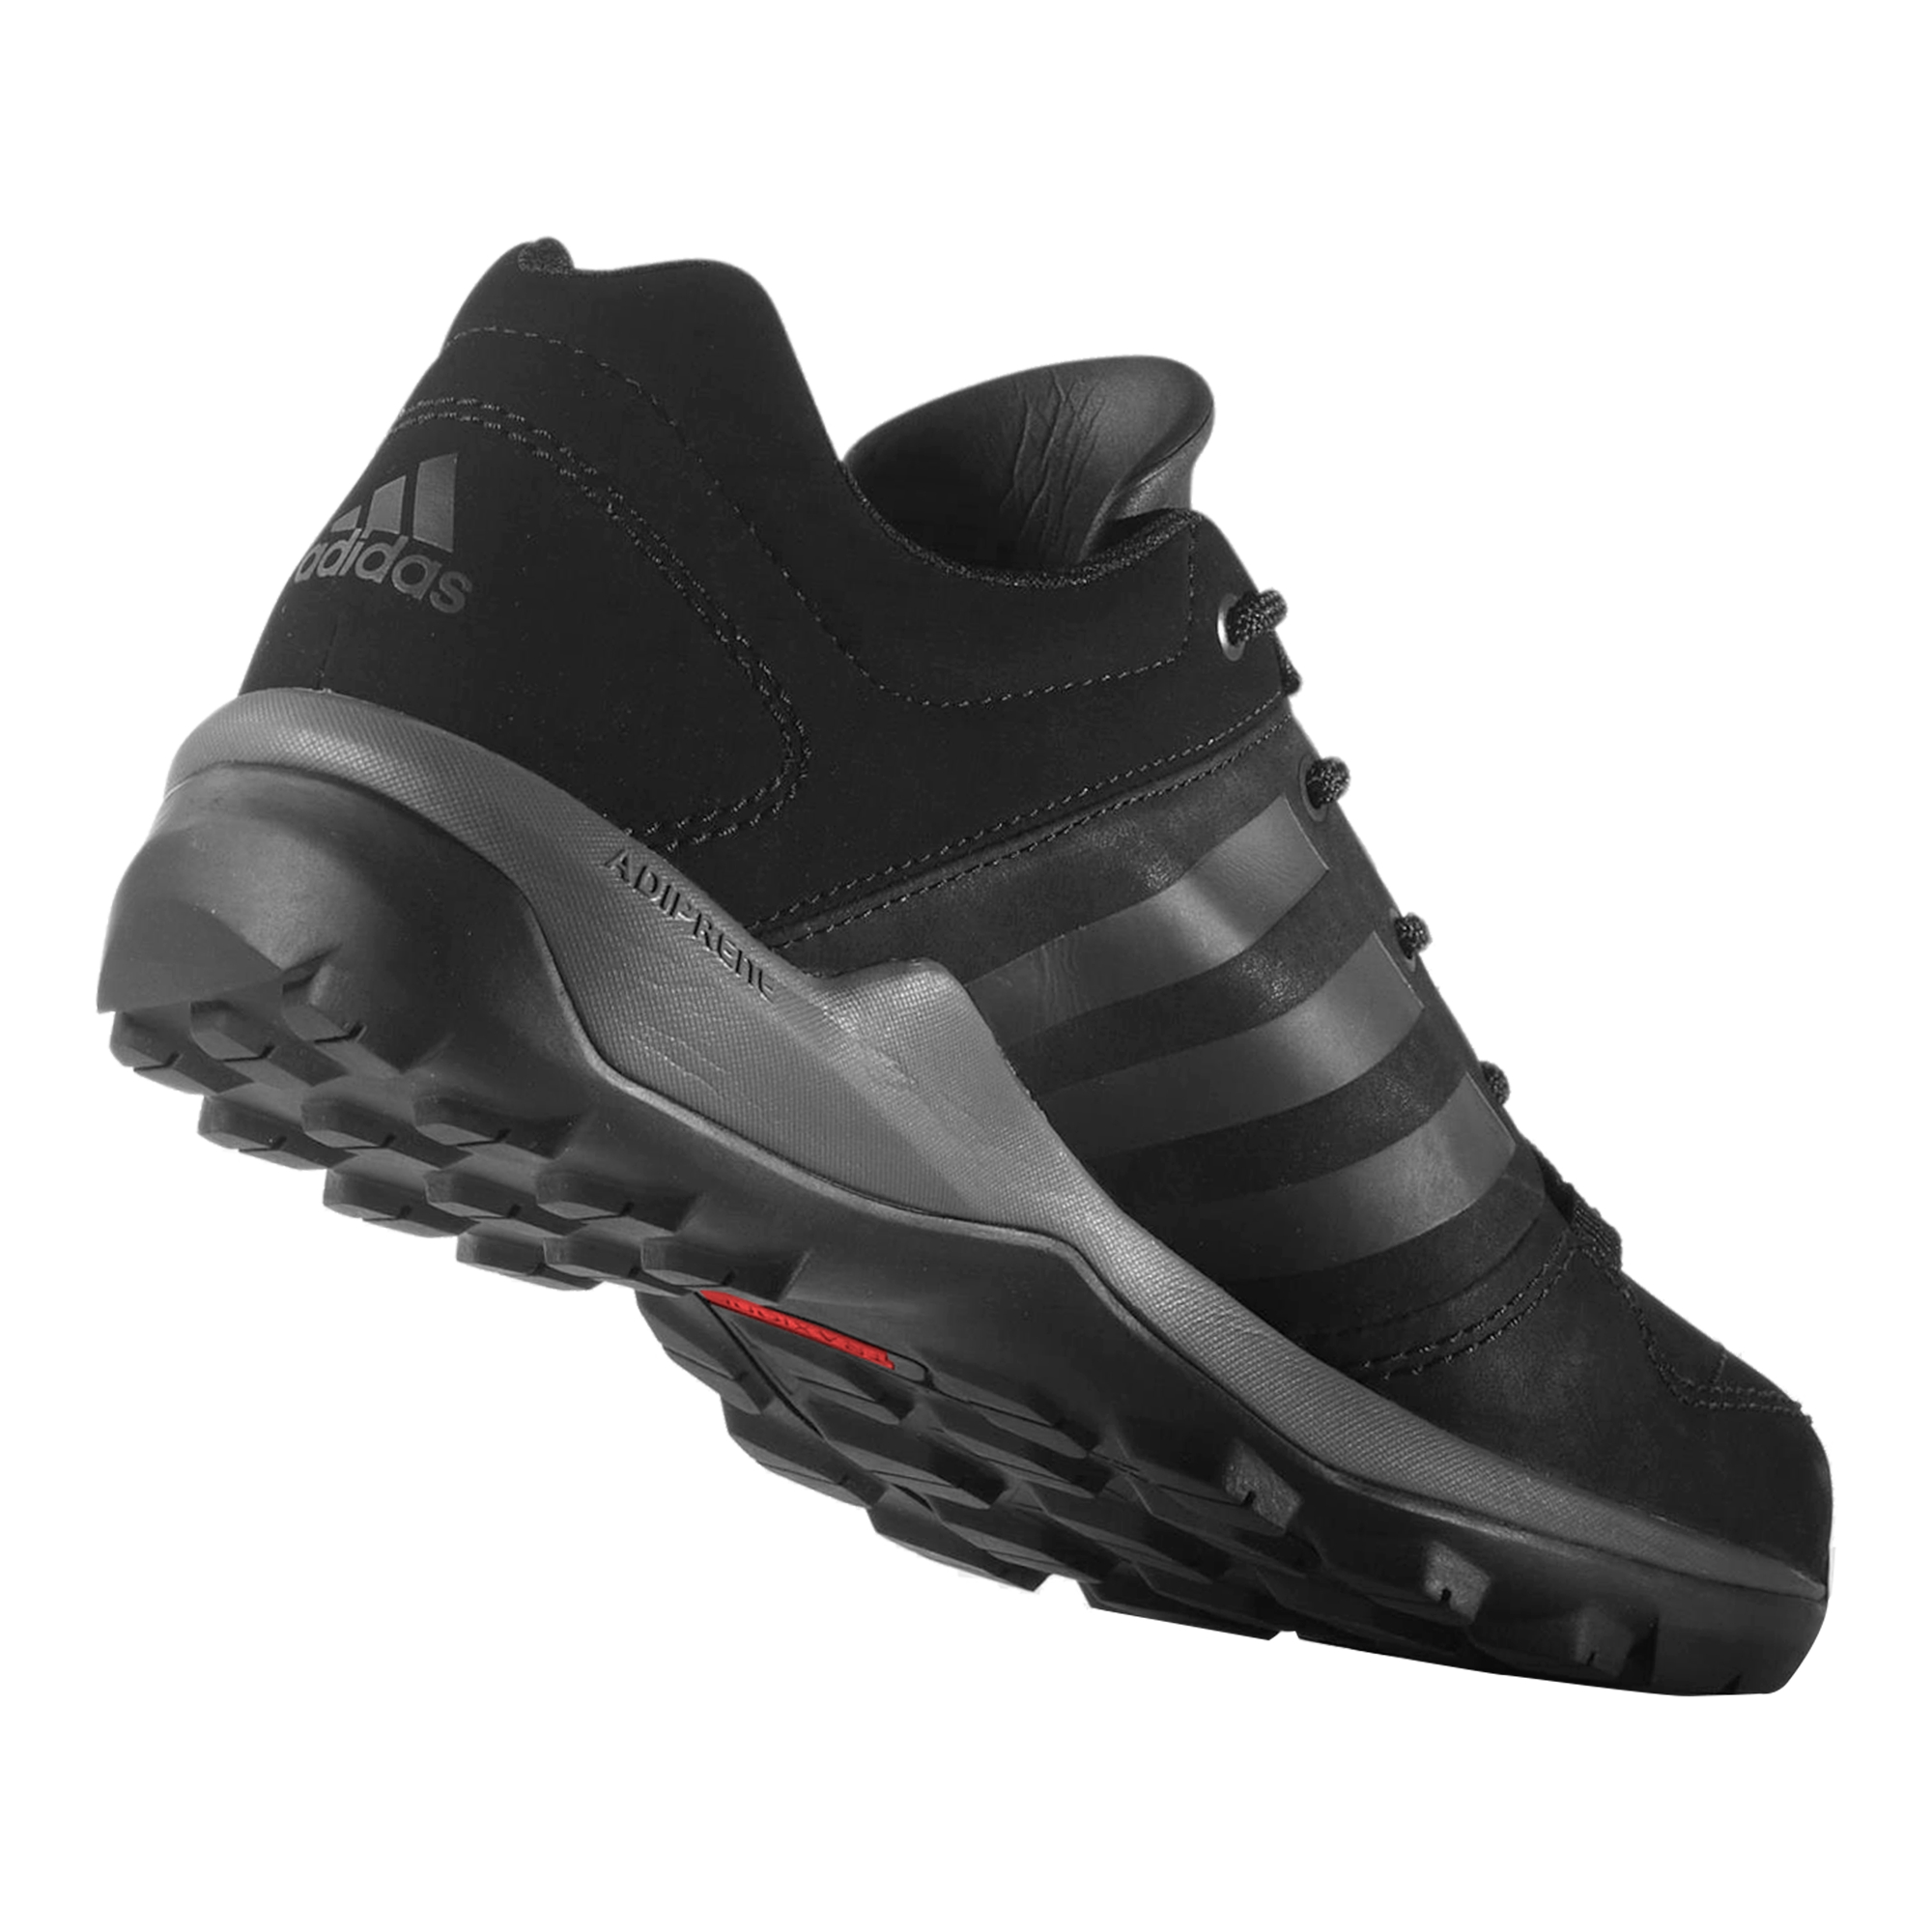 outlet store 6aabc 1abe1 adidas Daroga Plus Lea Outdoor Erkek Ayakkabı